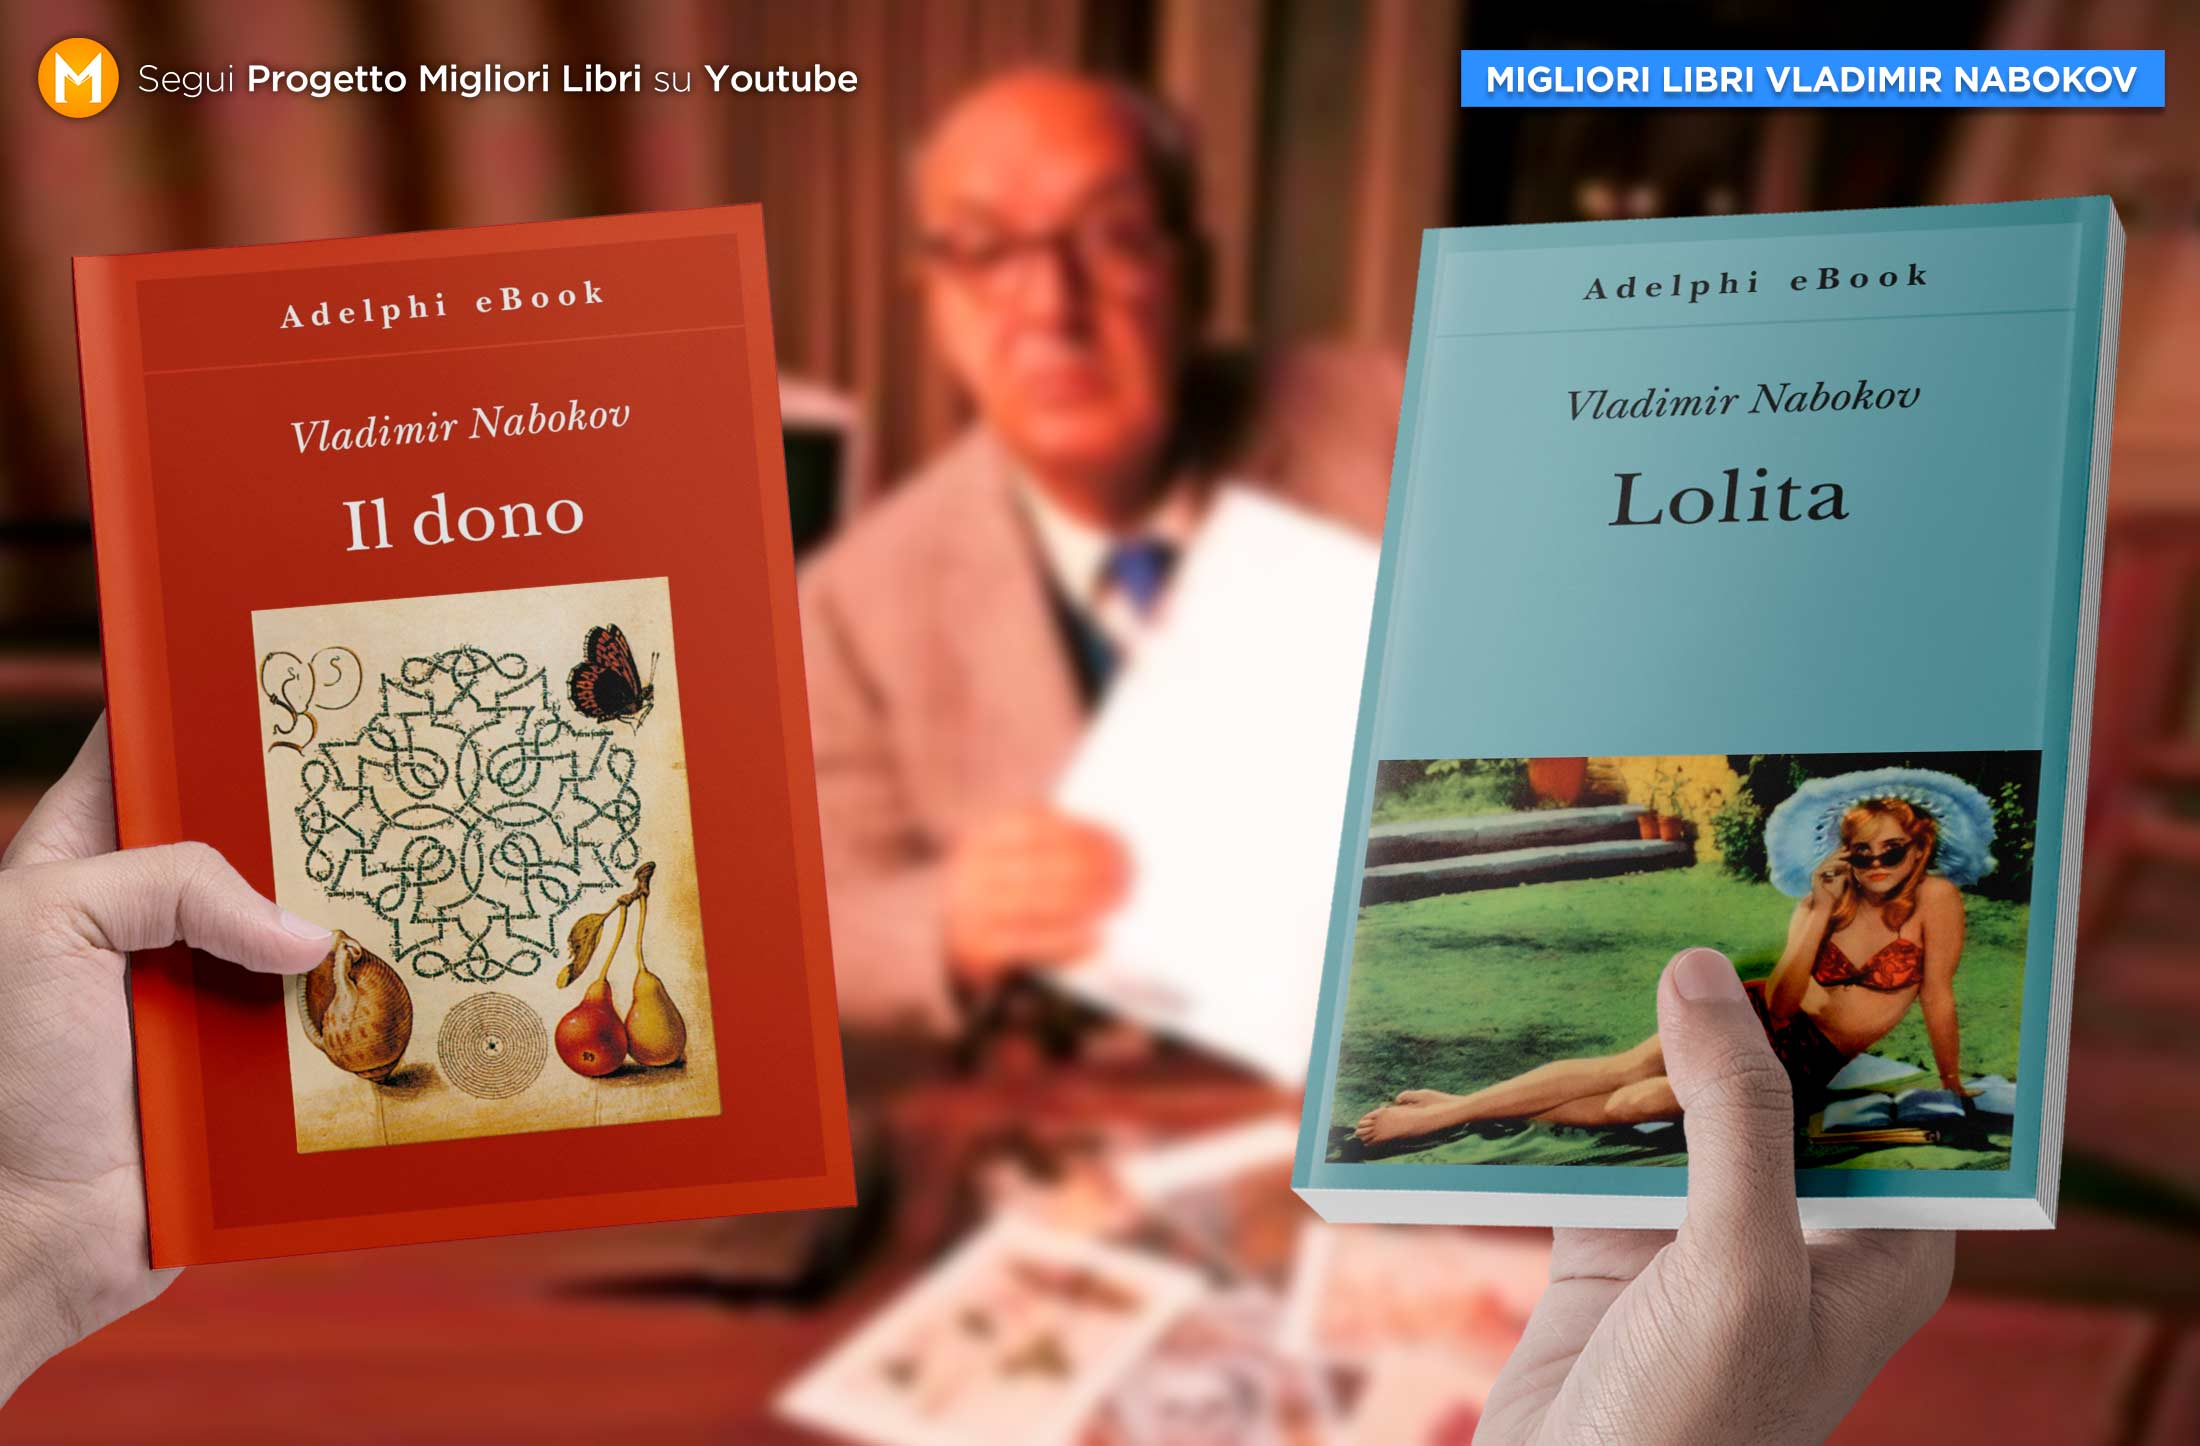 migliori-libri-vladimir-nabokov